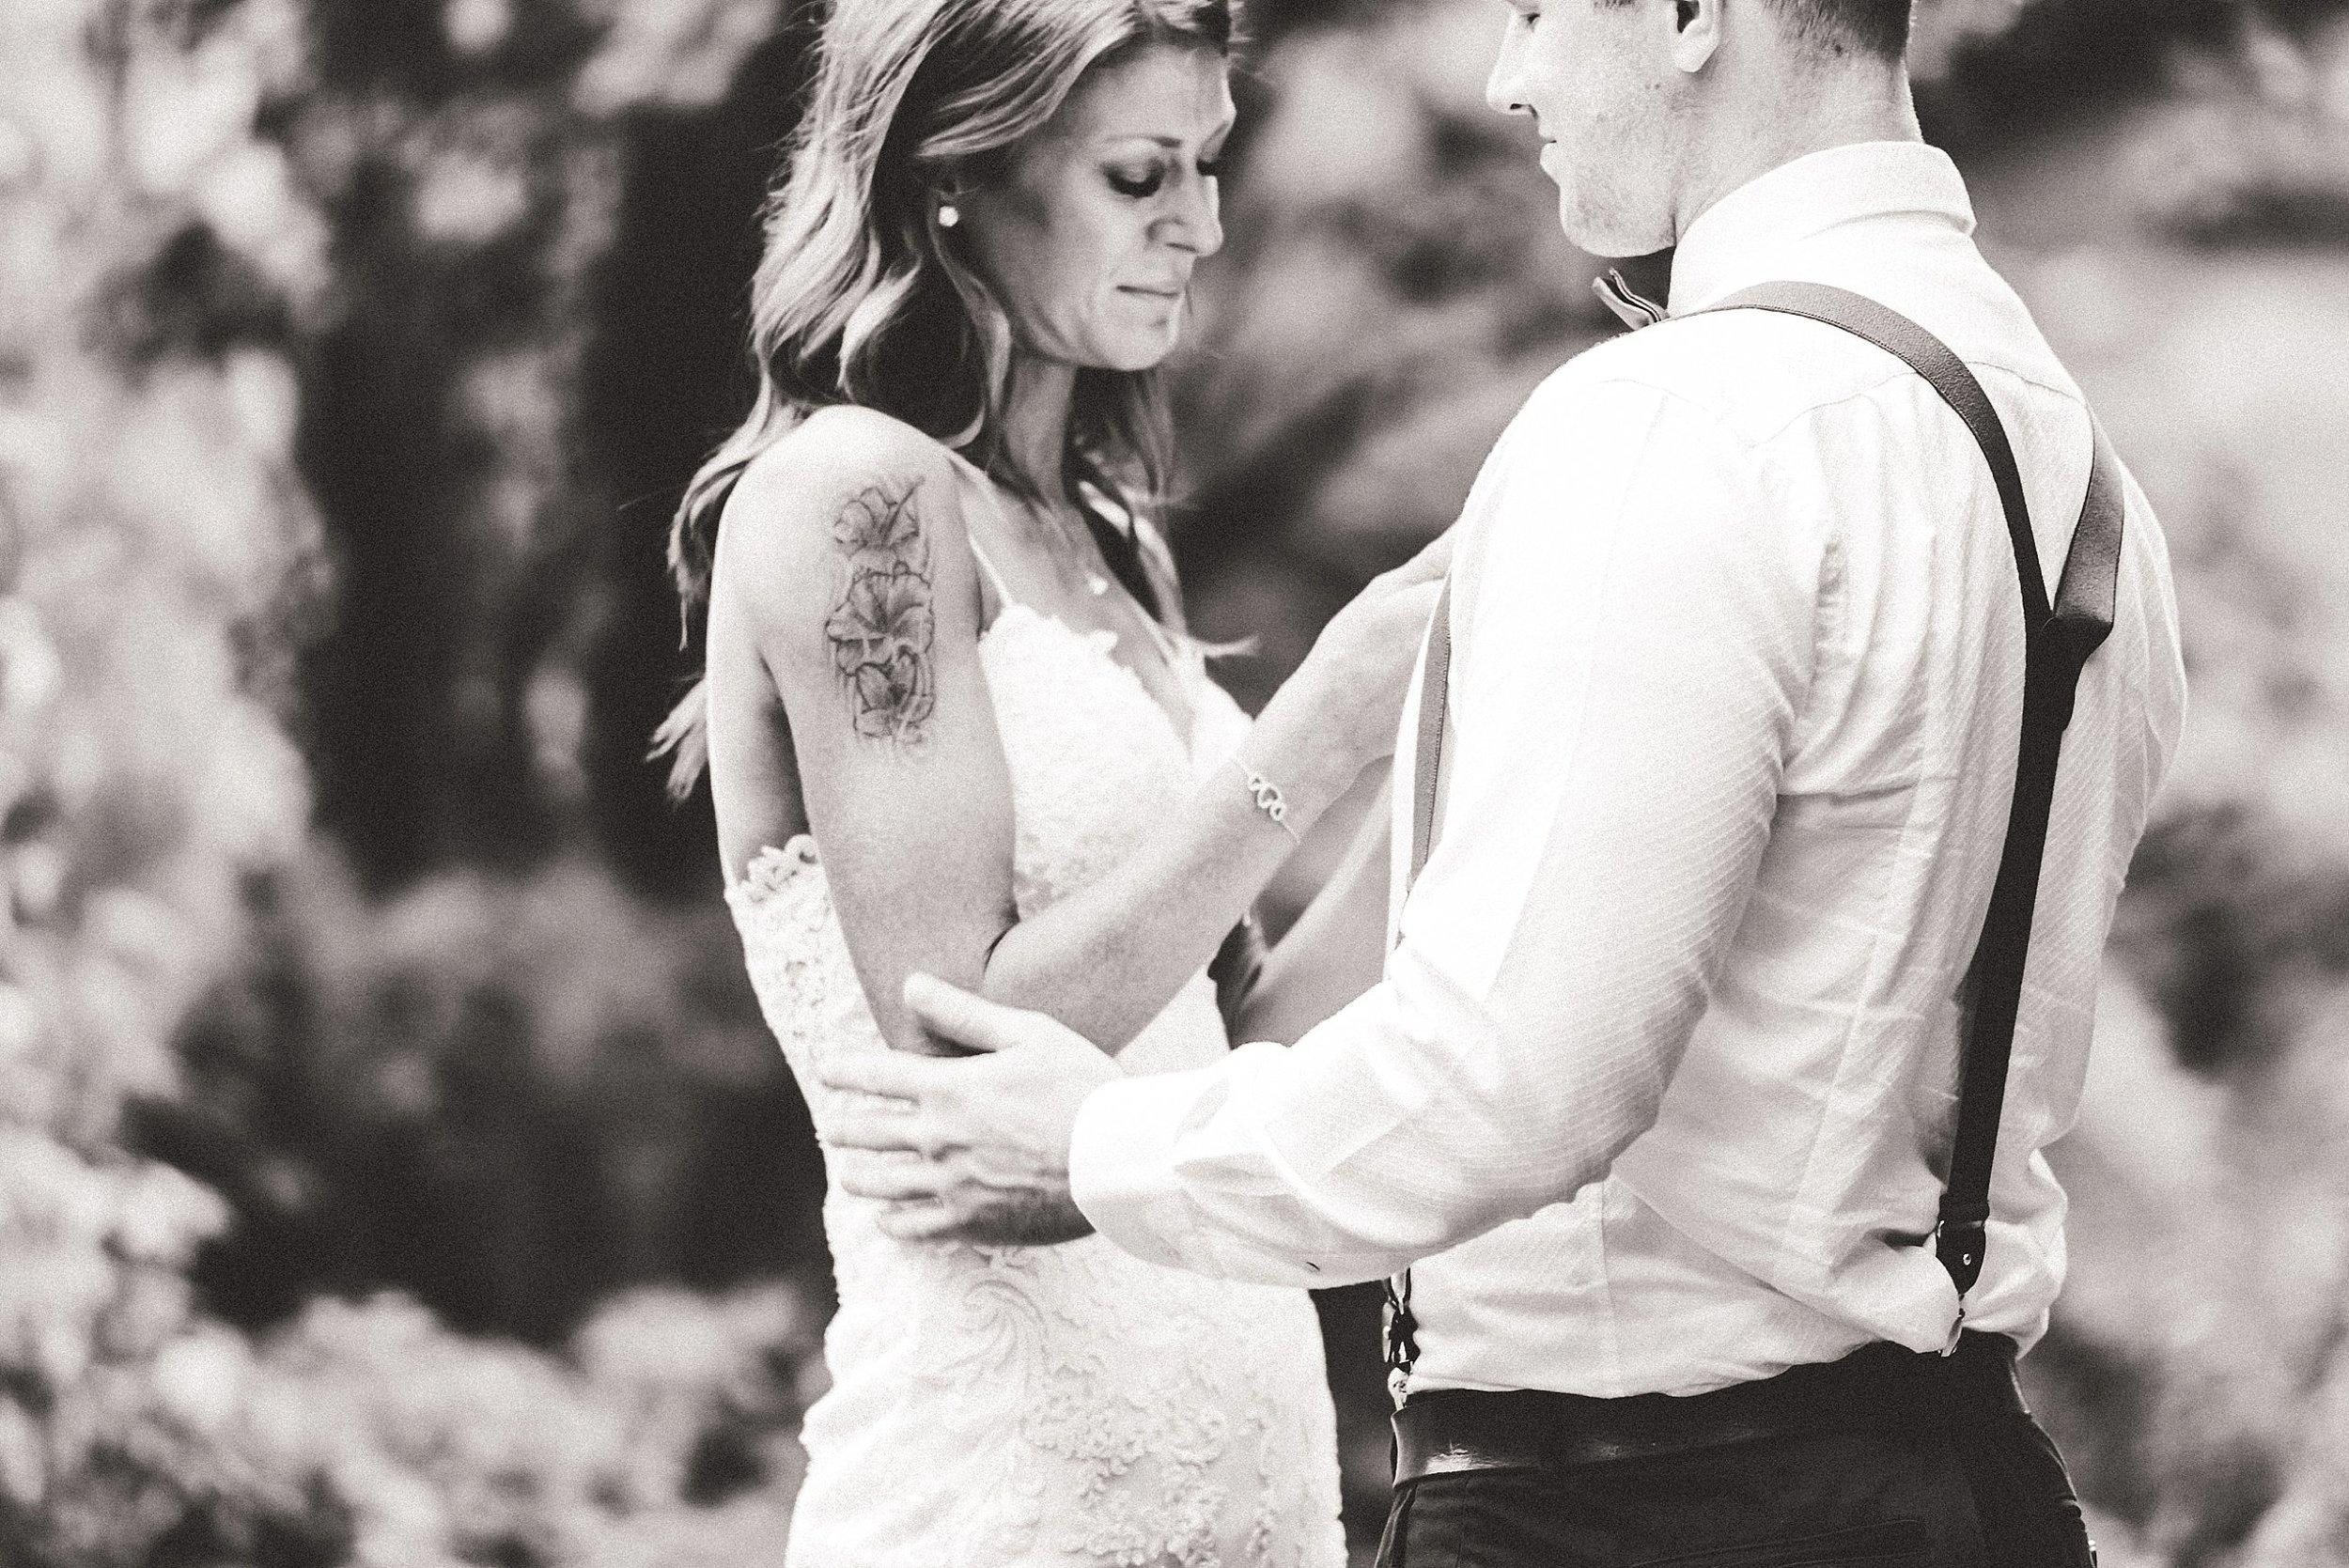 Ottawa Wedding Photographer - Stanley's Olde Maple Lane Barn Wedding - Ali & Batoul Photography_0013.jpg